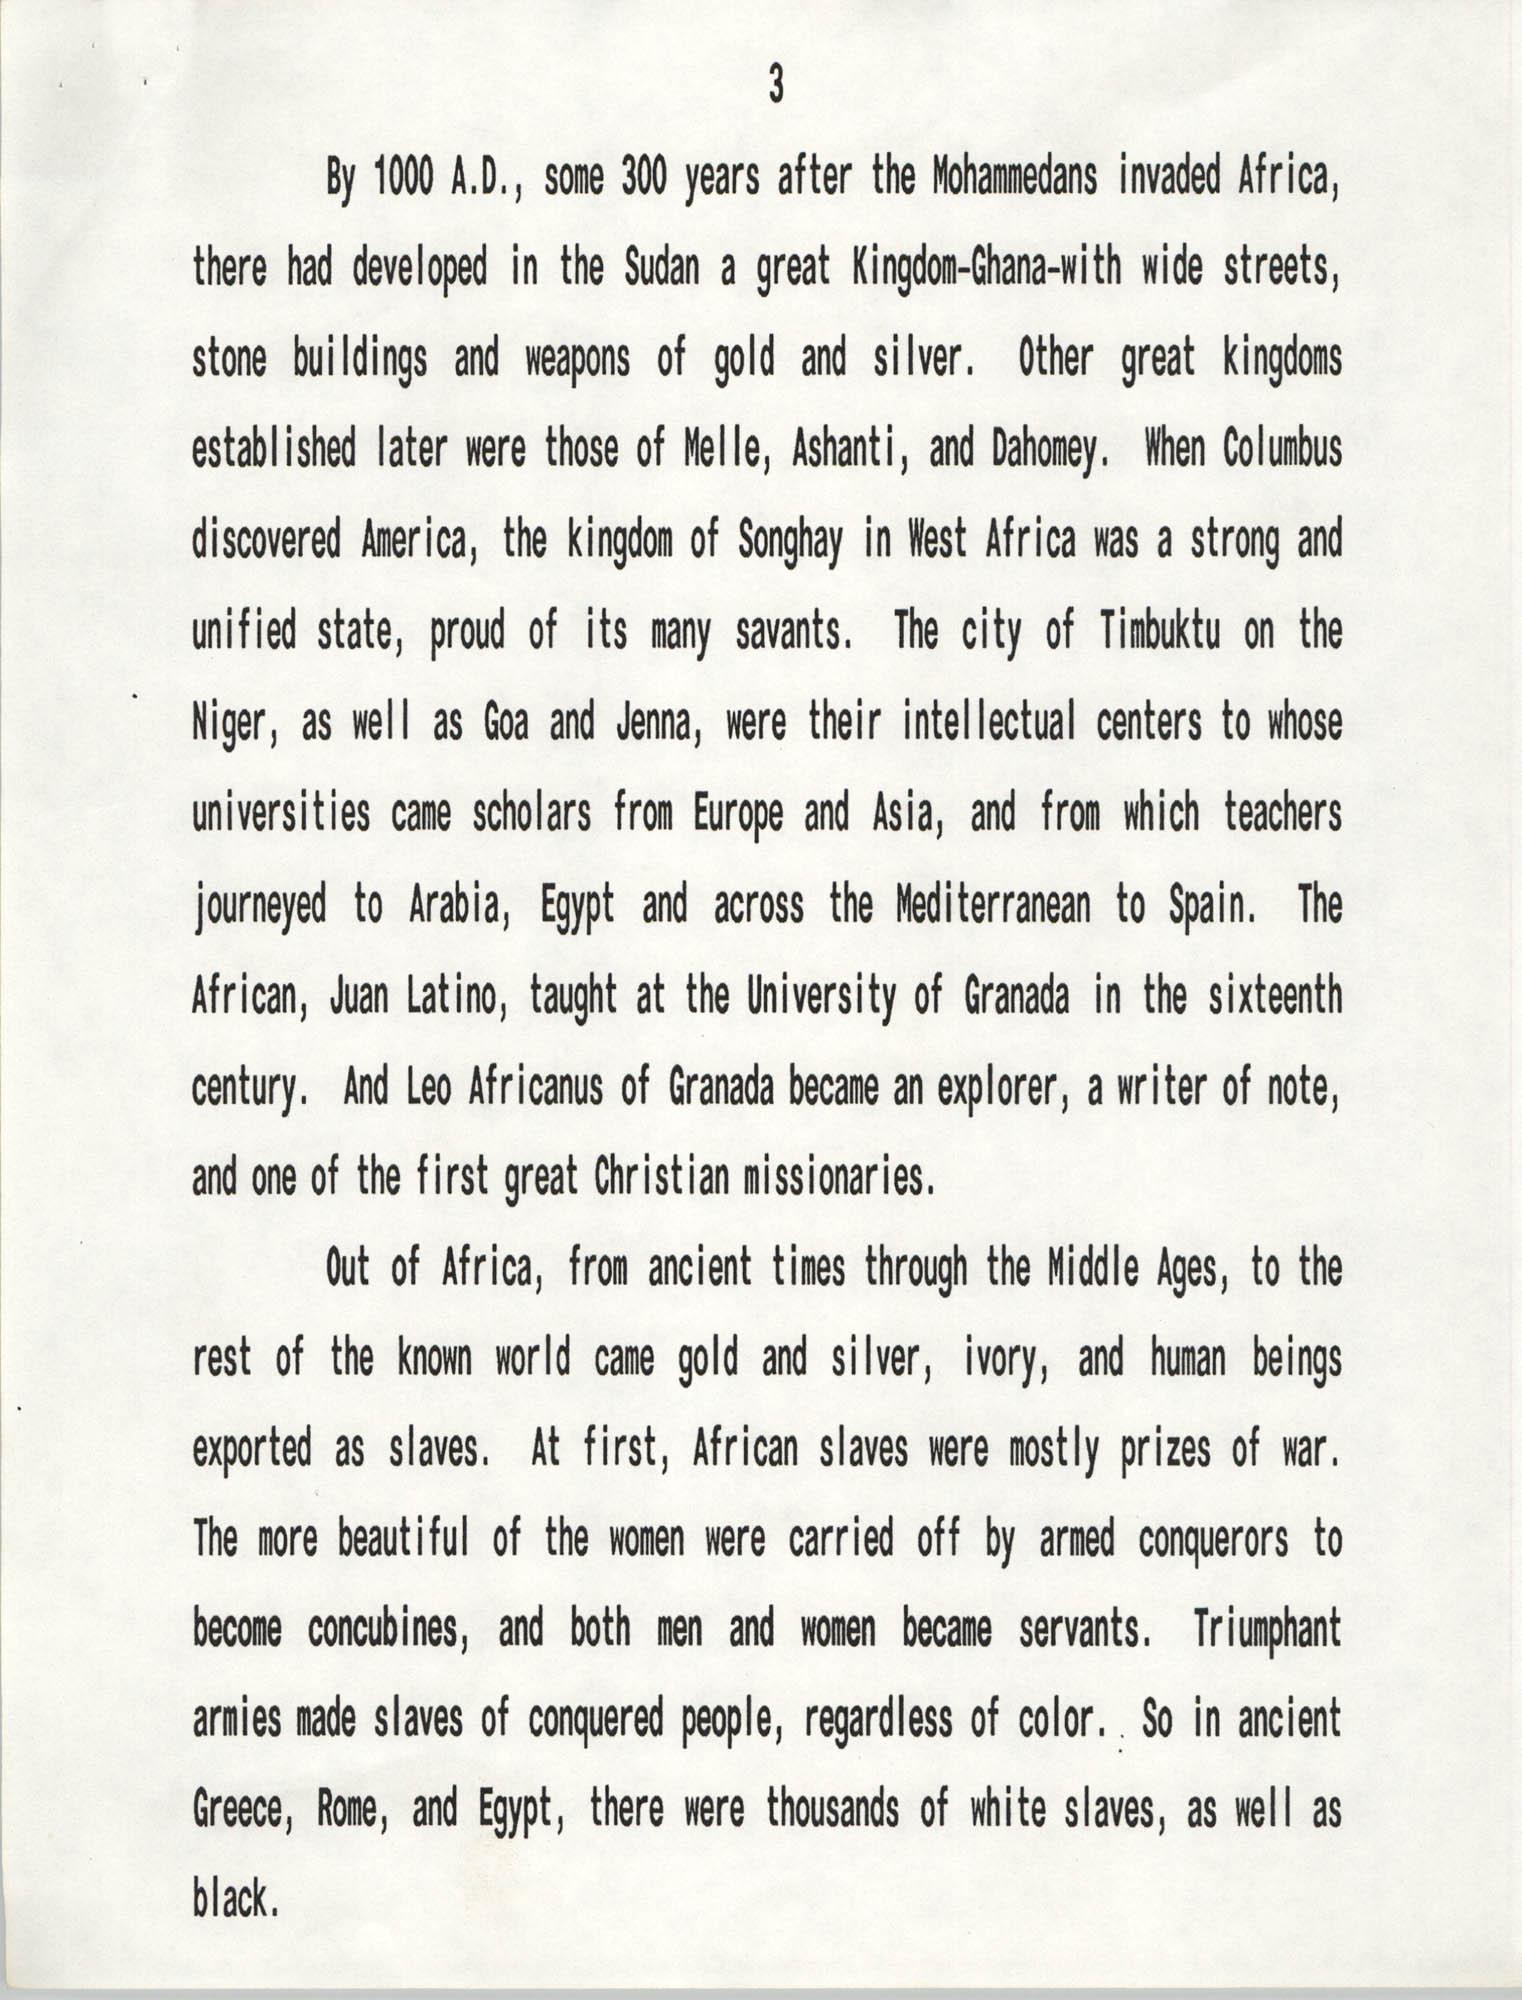 Senator Herbert U. Fielding, Black History Observance, February 28, 1988, Page 3